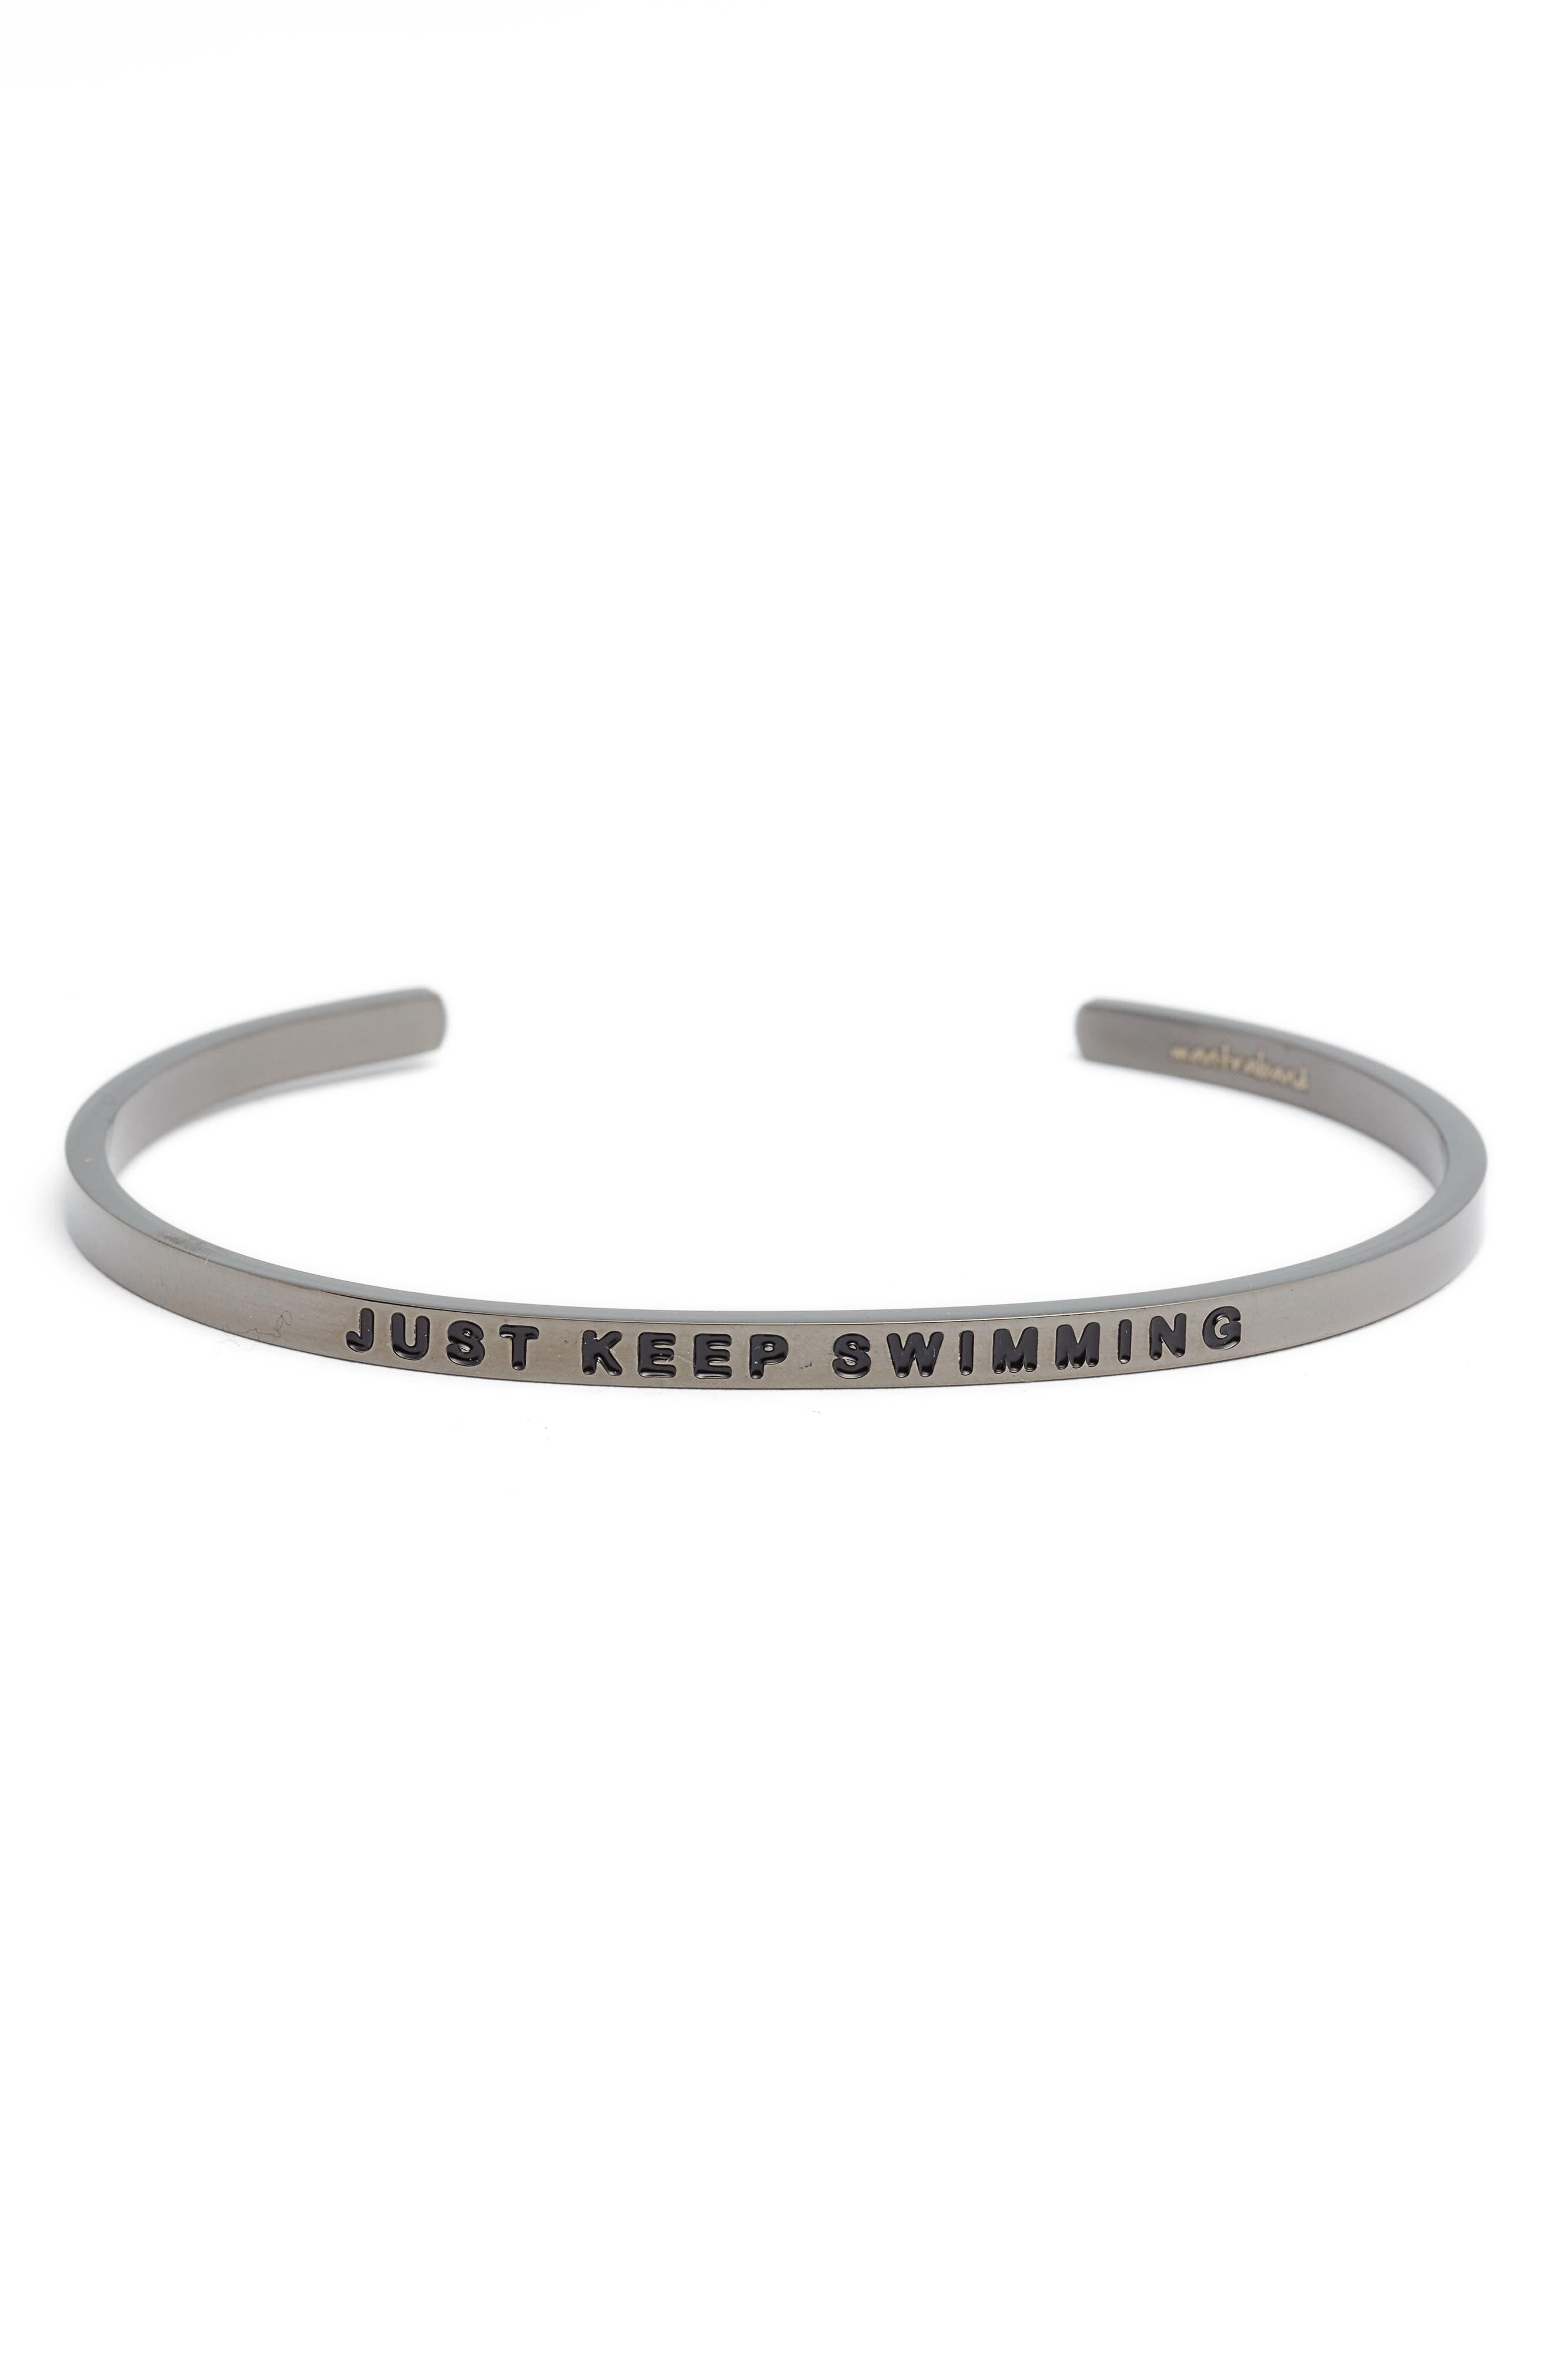 Just Keep Swimming Engraved Cuff,                             Main thumbnail 1, color,                             021